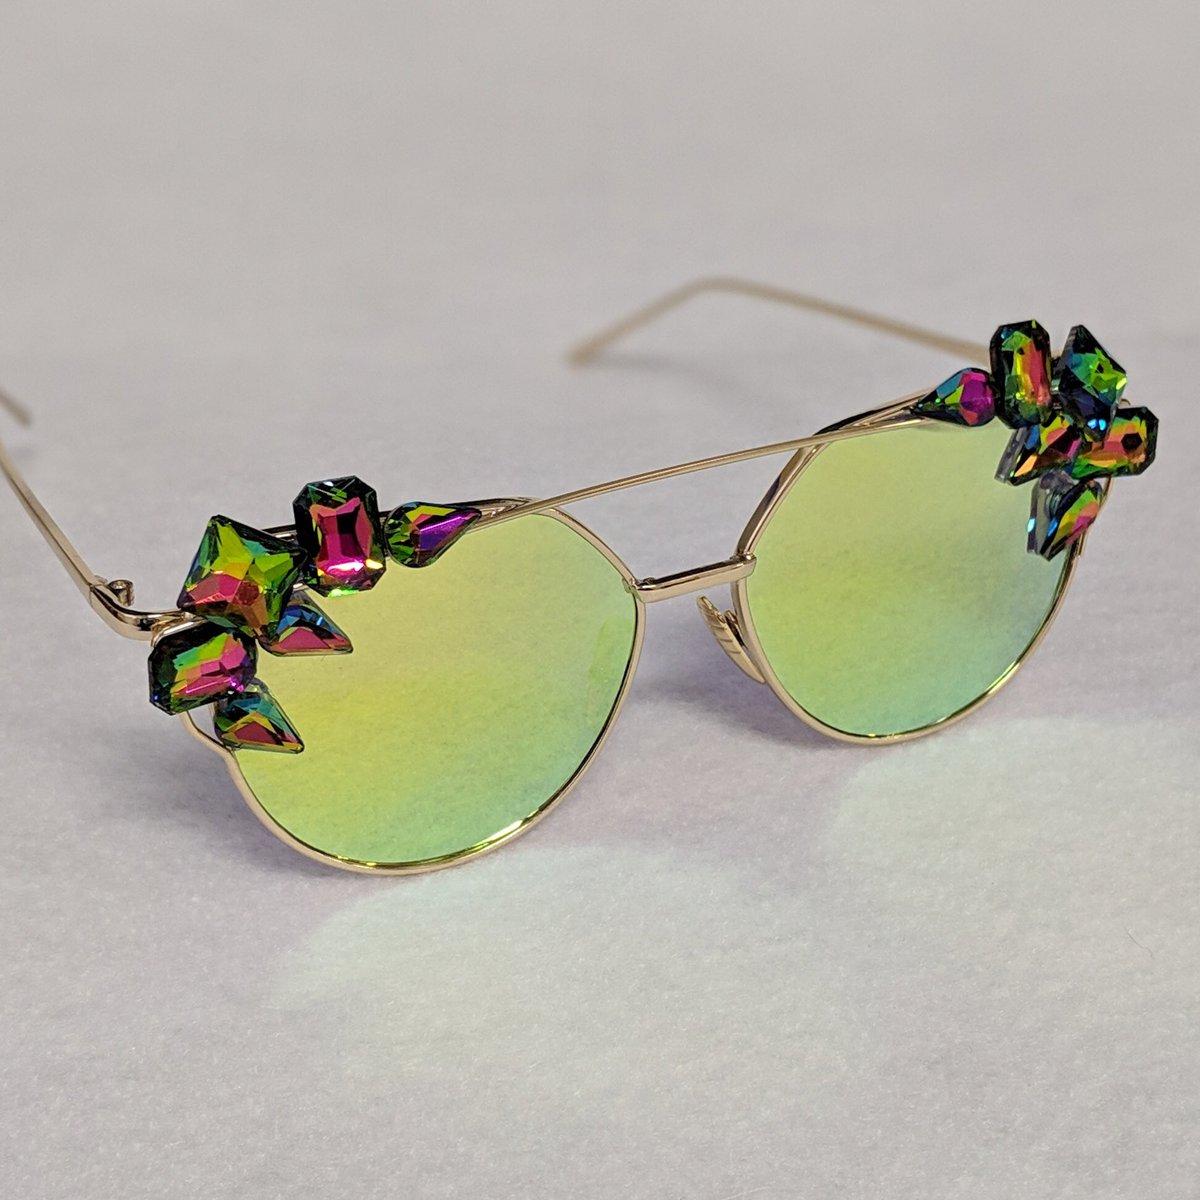 31830cda181  Trendy  Summer  Sunglasses Get yours here  https   www.etsy .com listing 555292527 gold-embellished-rhinestone-crystal  …pic.twitter.com I6RLJ1wwDC